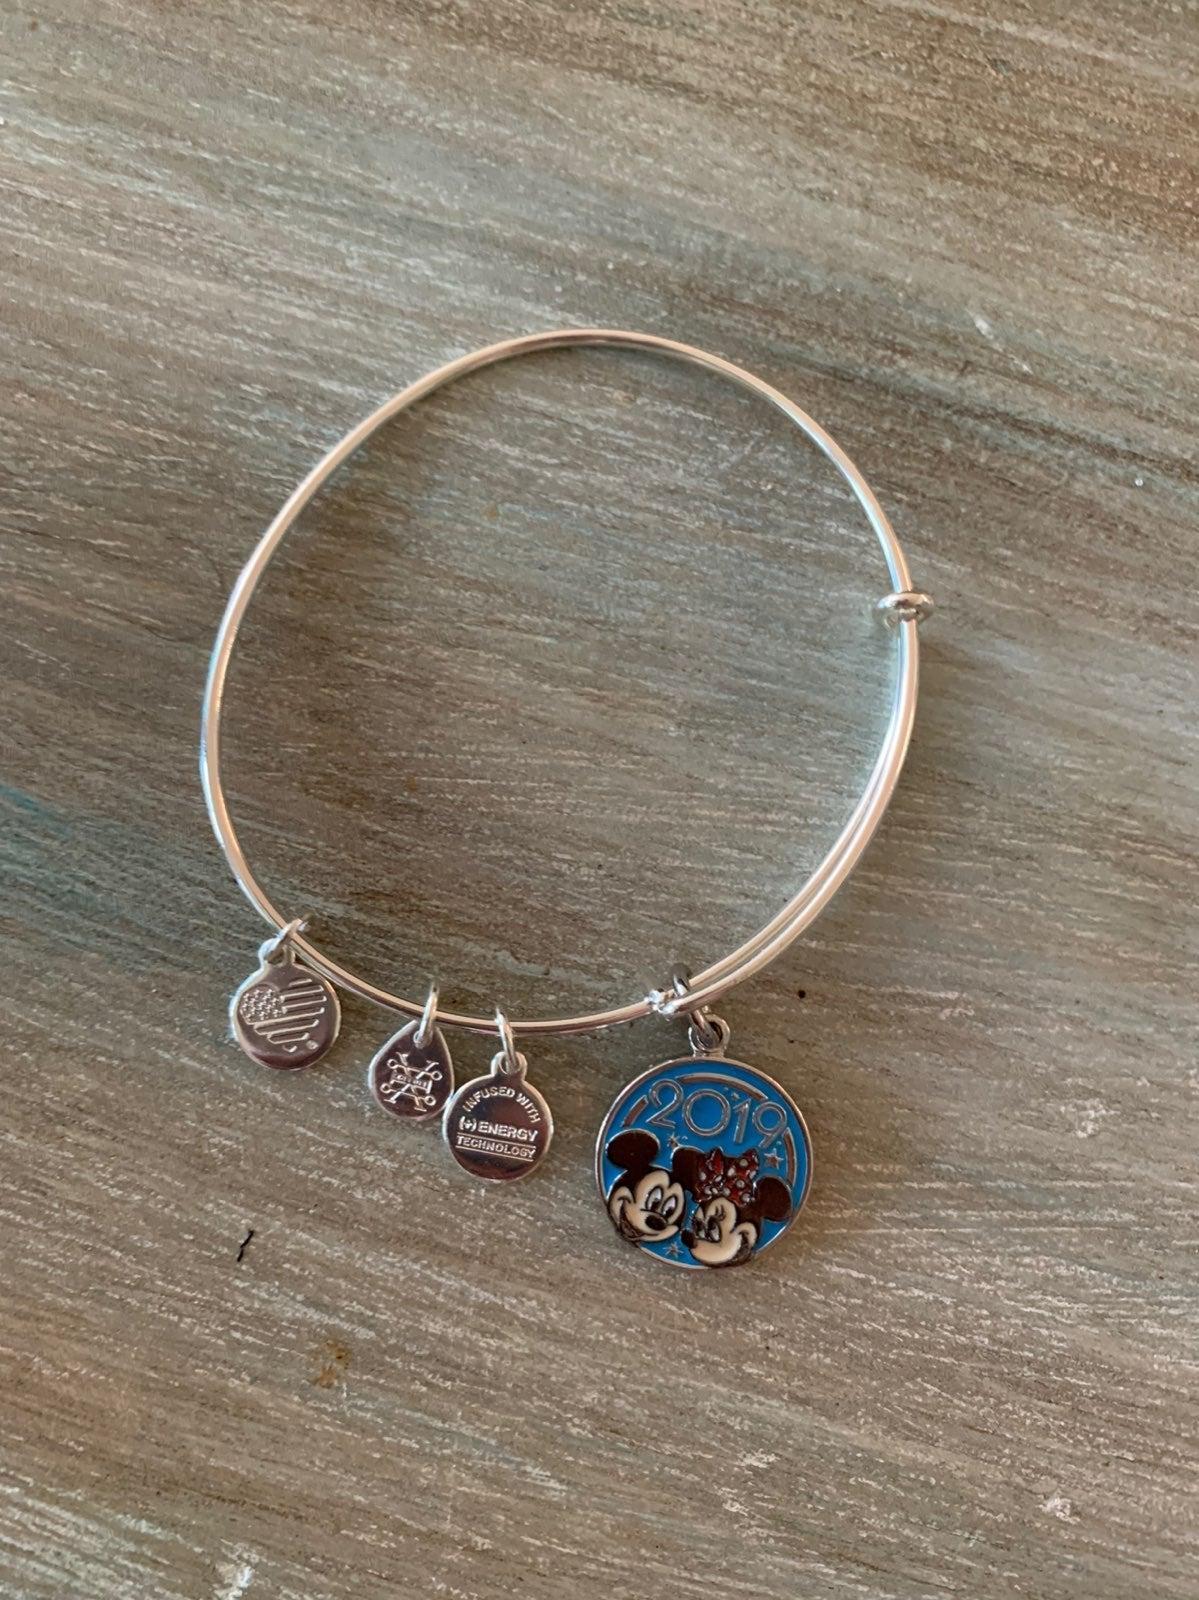 2019 disney alex and ani bracelet